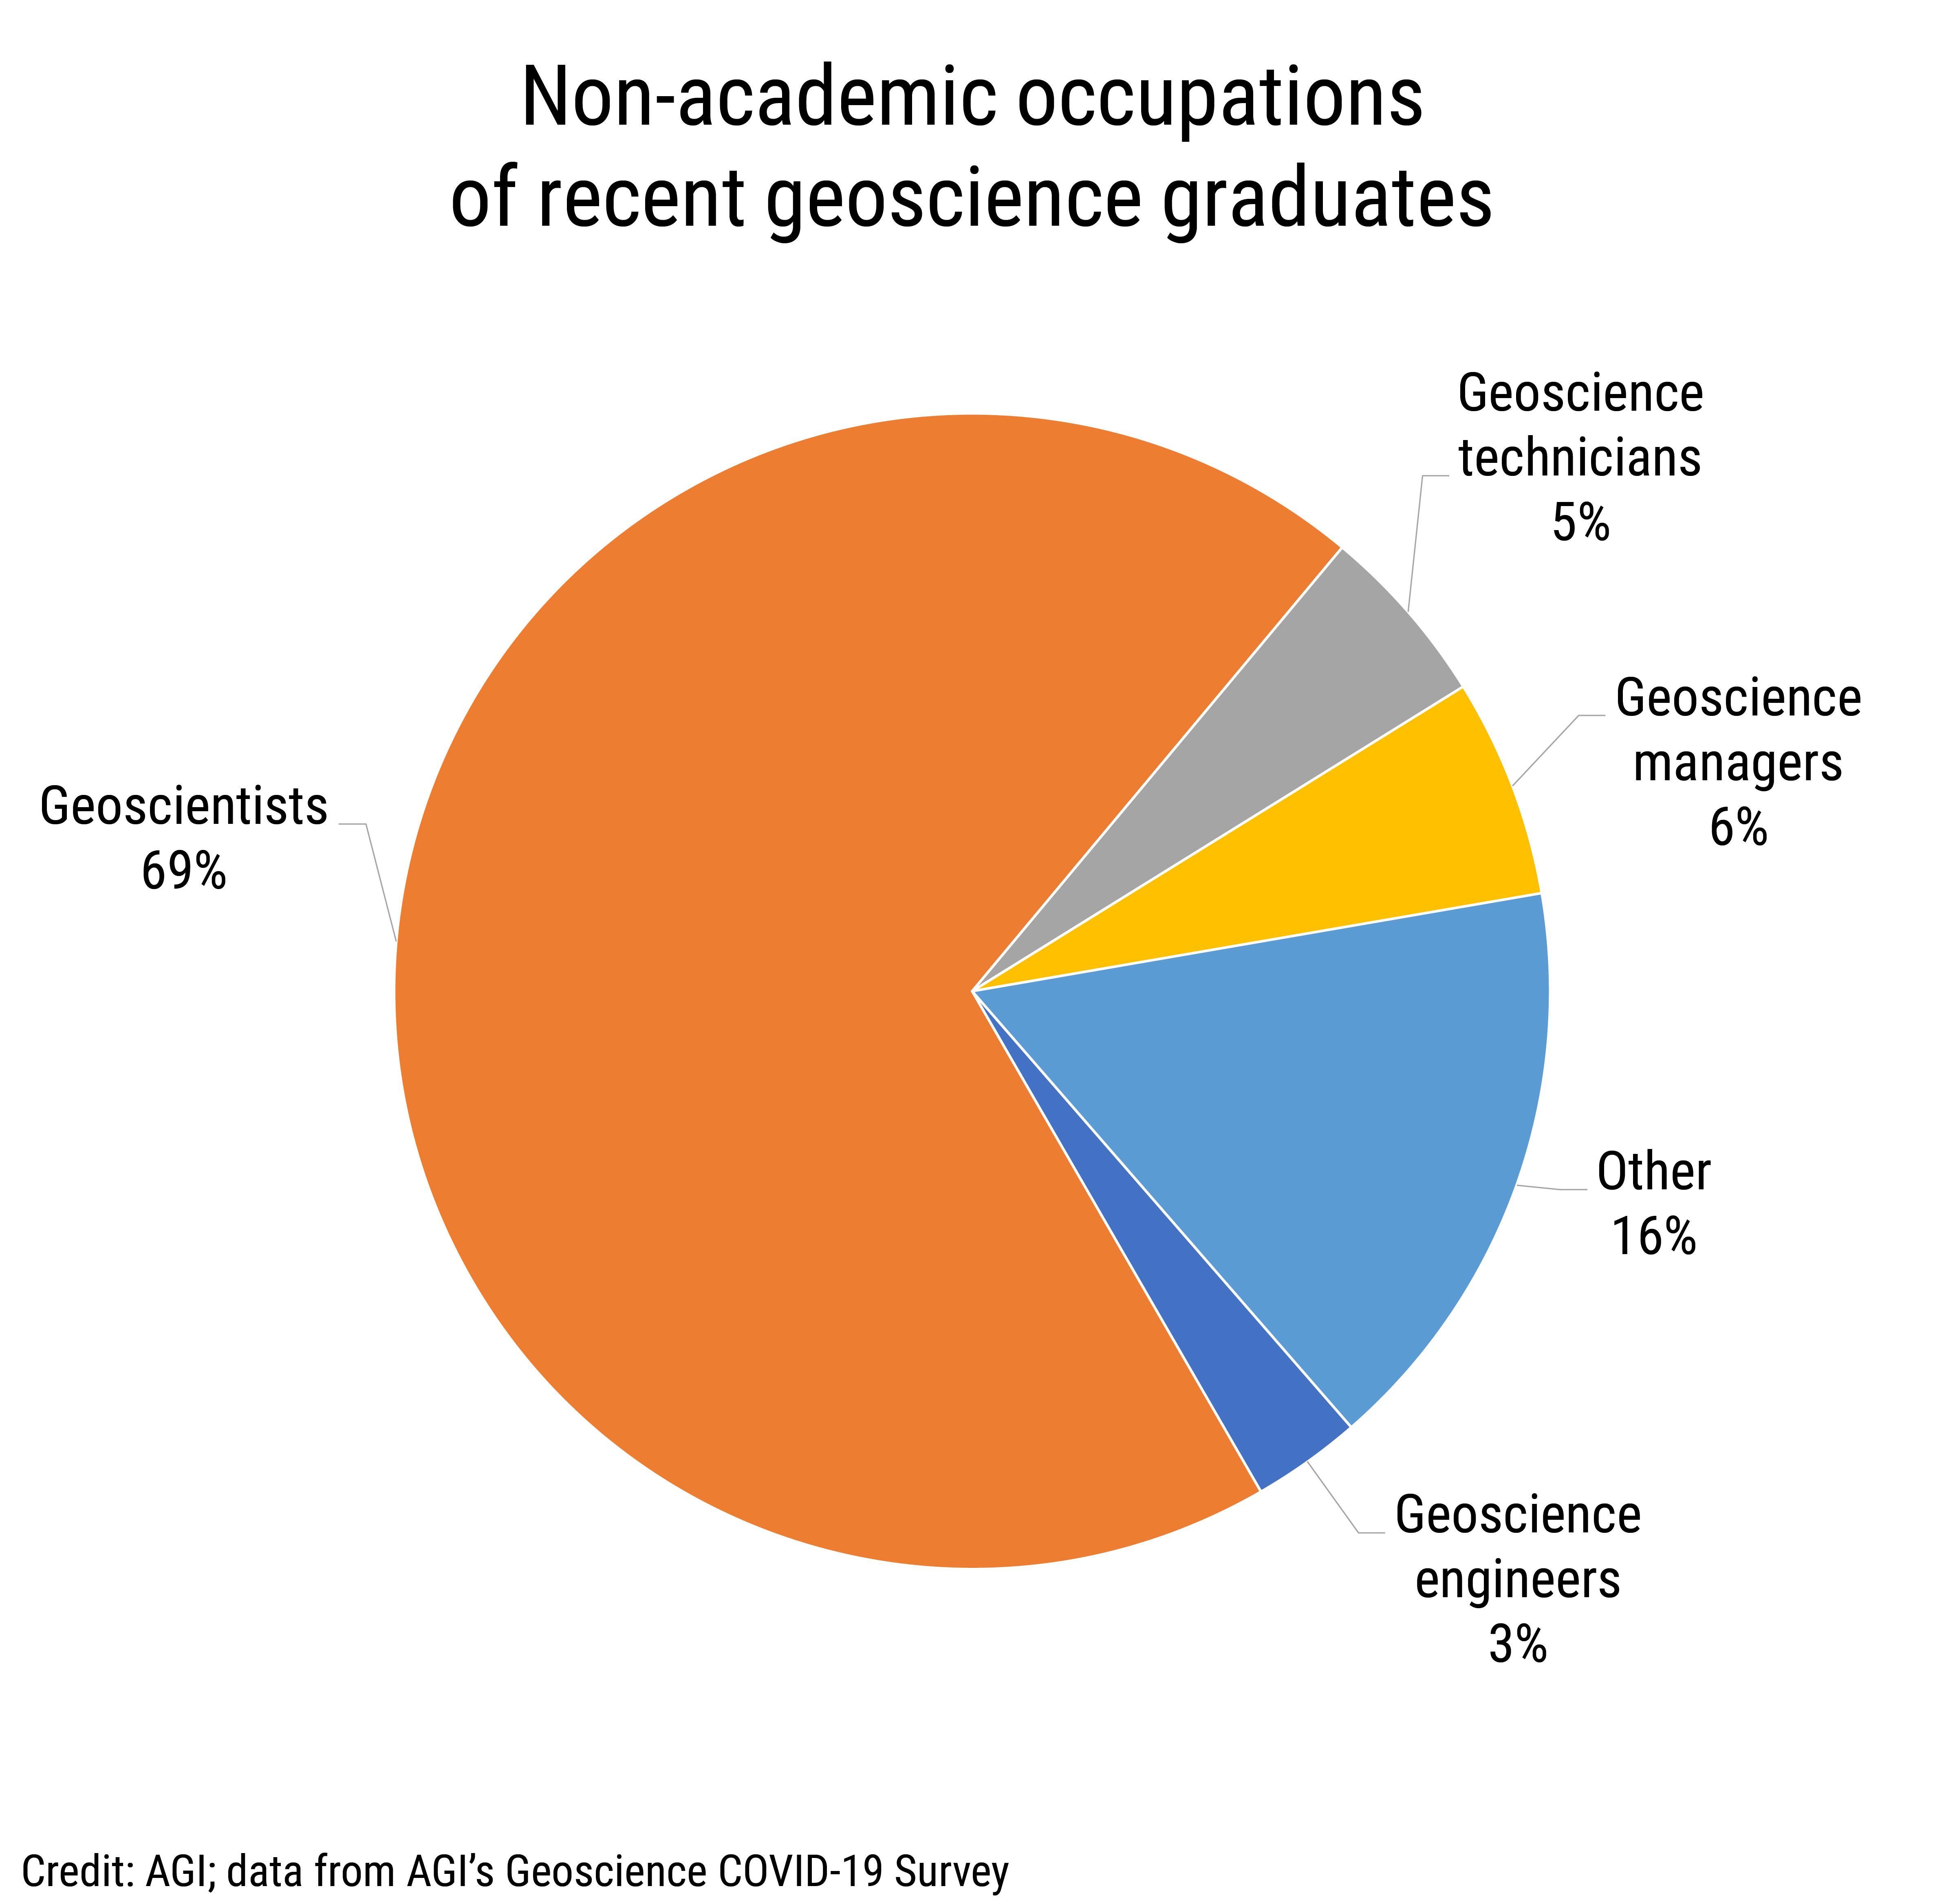 Data Brief 2020-010 chart 03: Non-academic occupations of recent geoscience graduates (credit: AGI; data from AGI's Geoscience COVID-19 Survey)